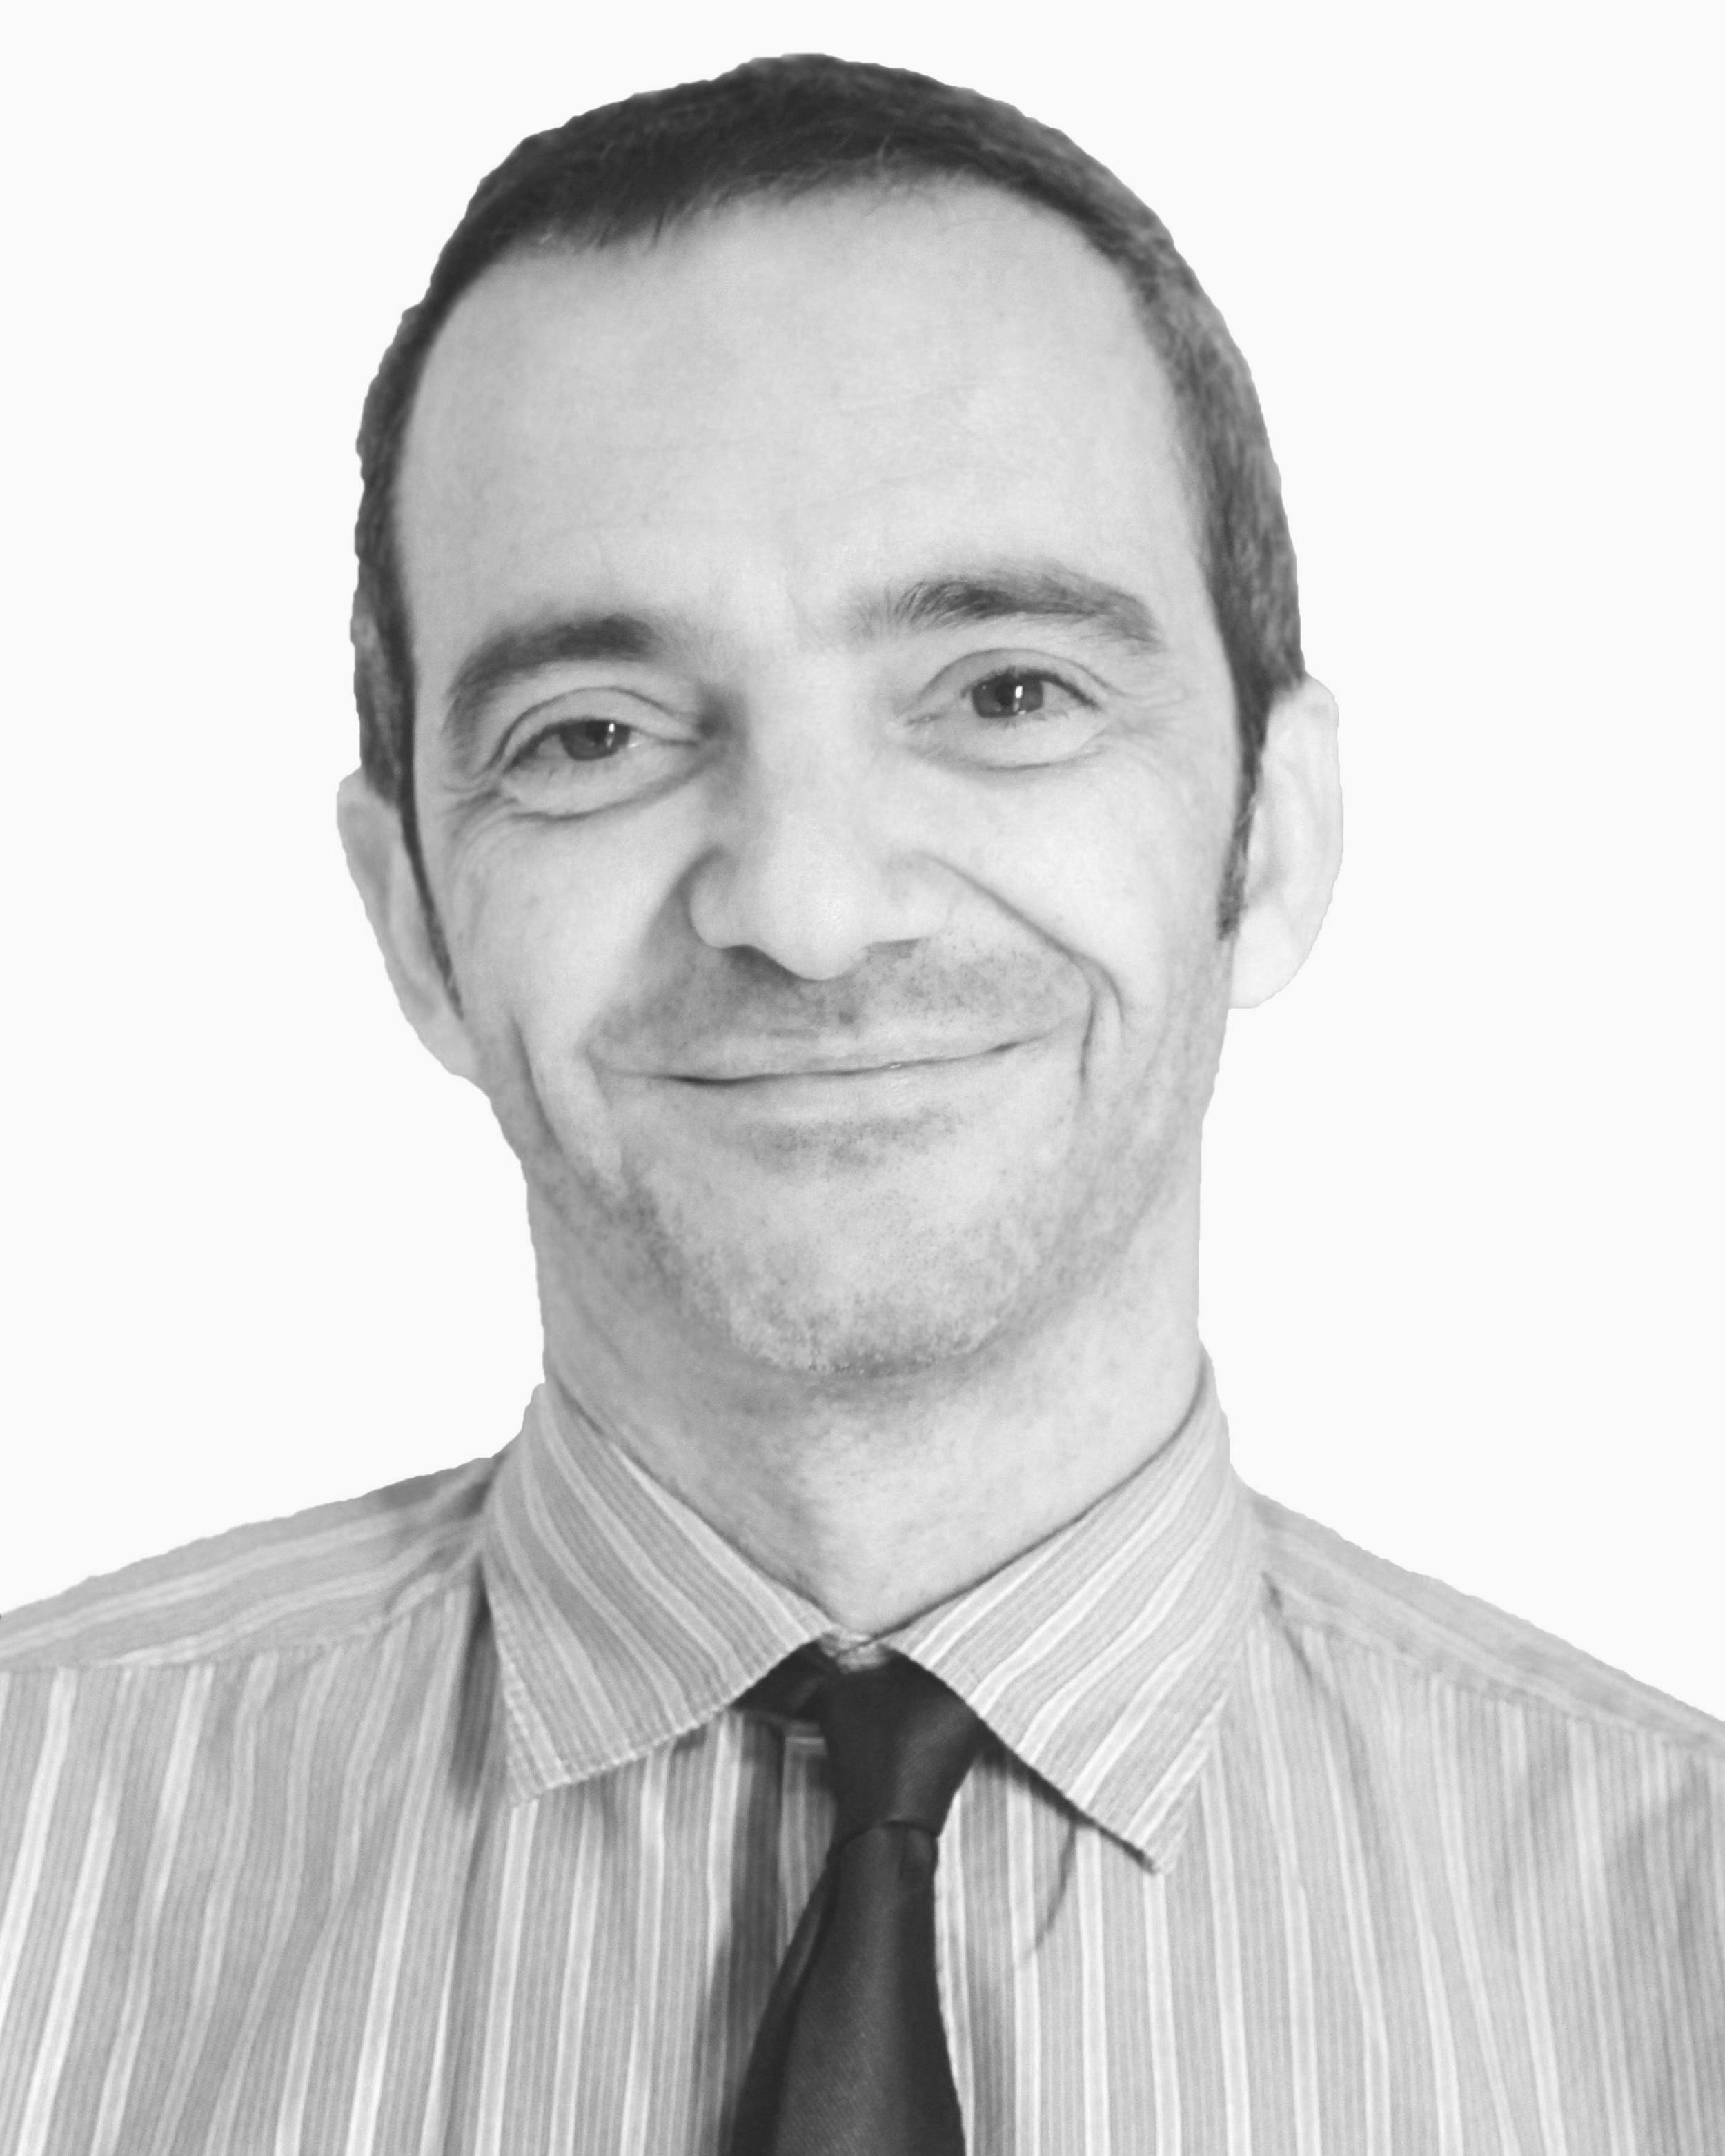 Andreu Gusi - Executive Director at the European Society for Blood and Marrow Transplantation (EBMT)